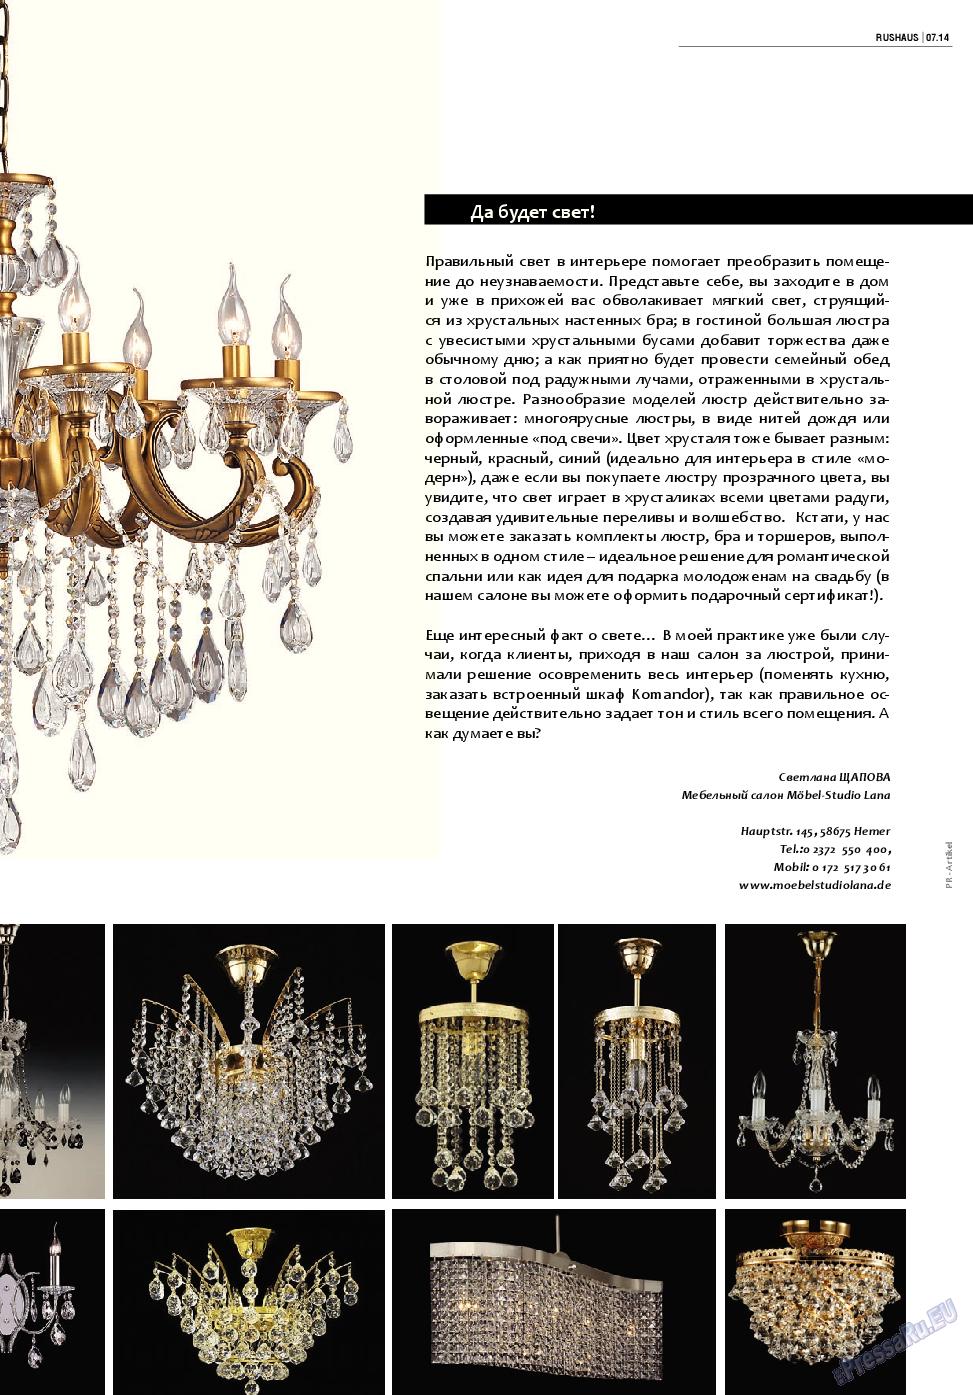 RusHaus (журнал). 2014 год, номер 1, стр. 7